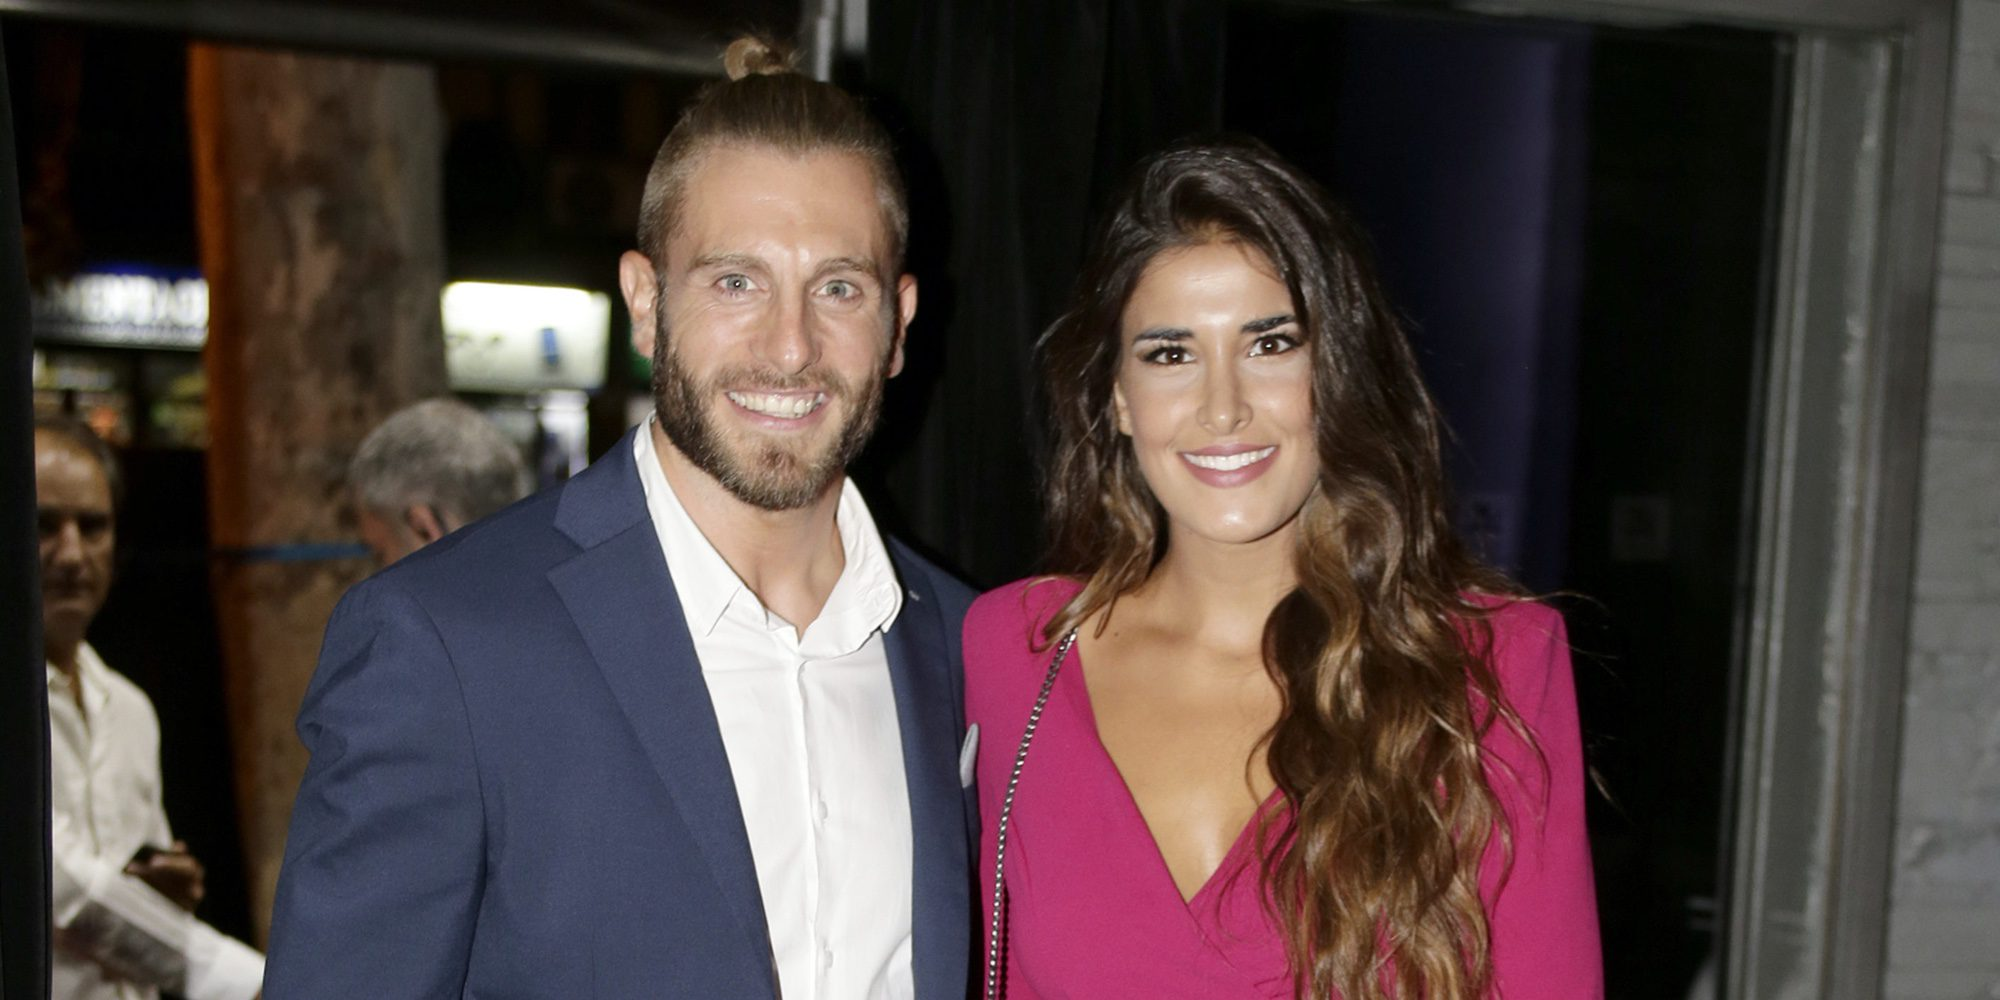 Lidia Torrent y Matías Roure de 'First Dates', pillados besándose apasionadamente